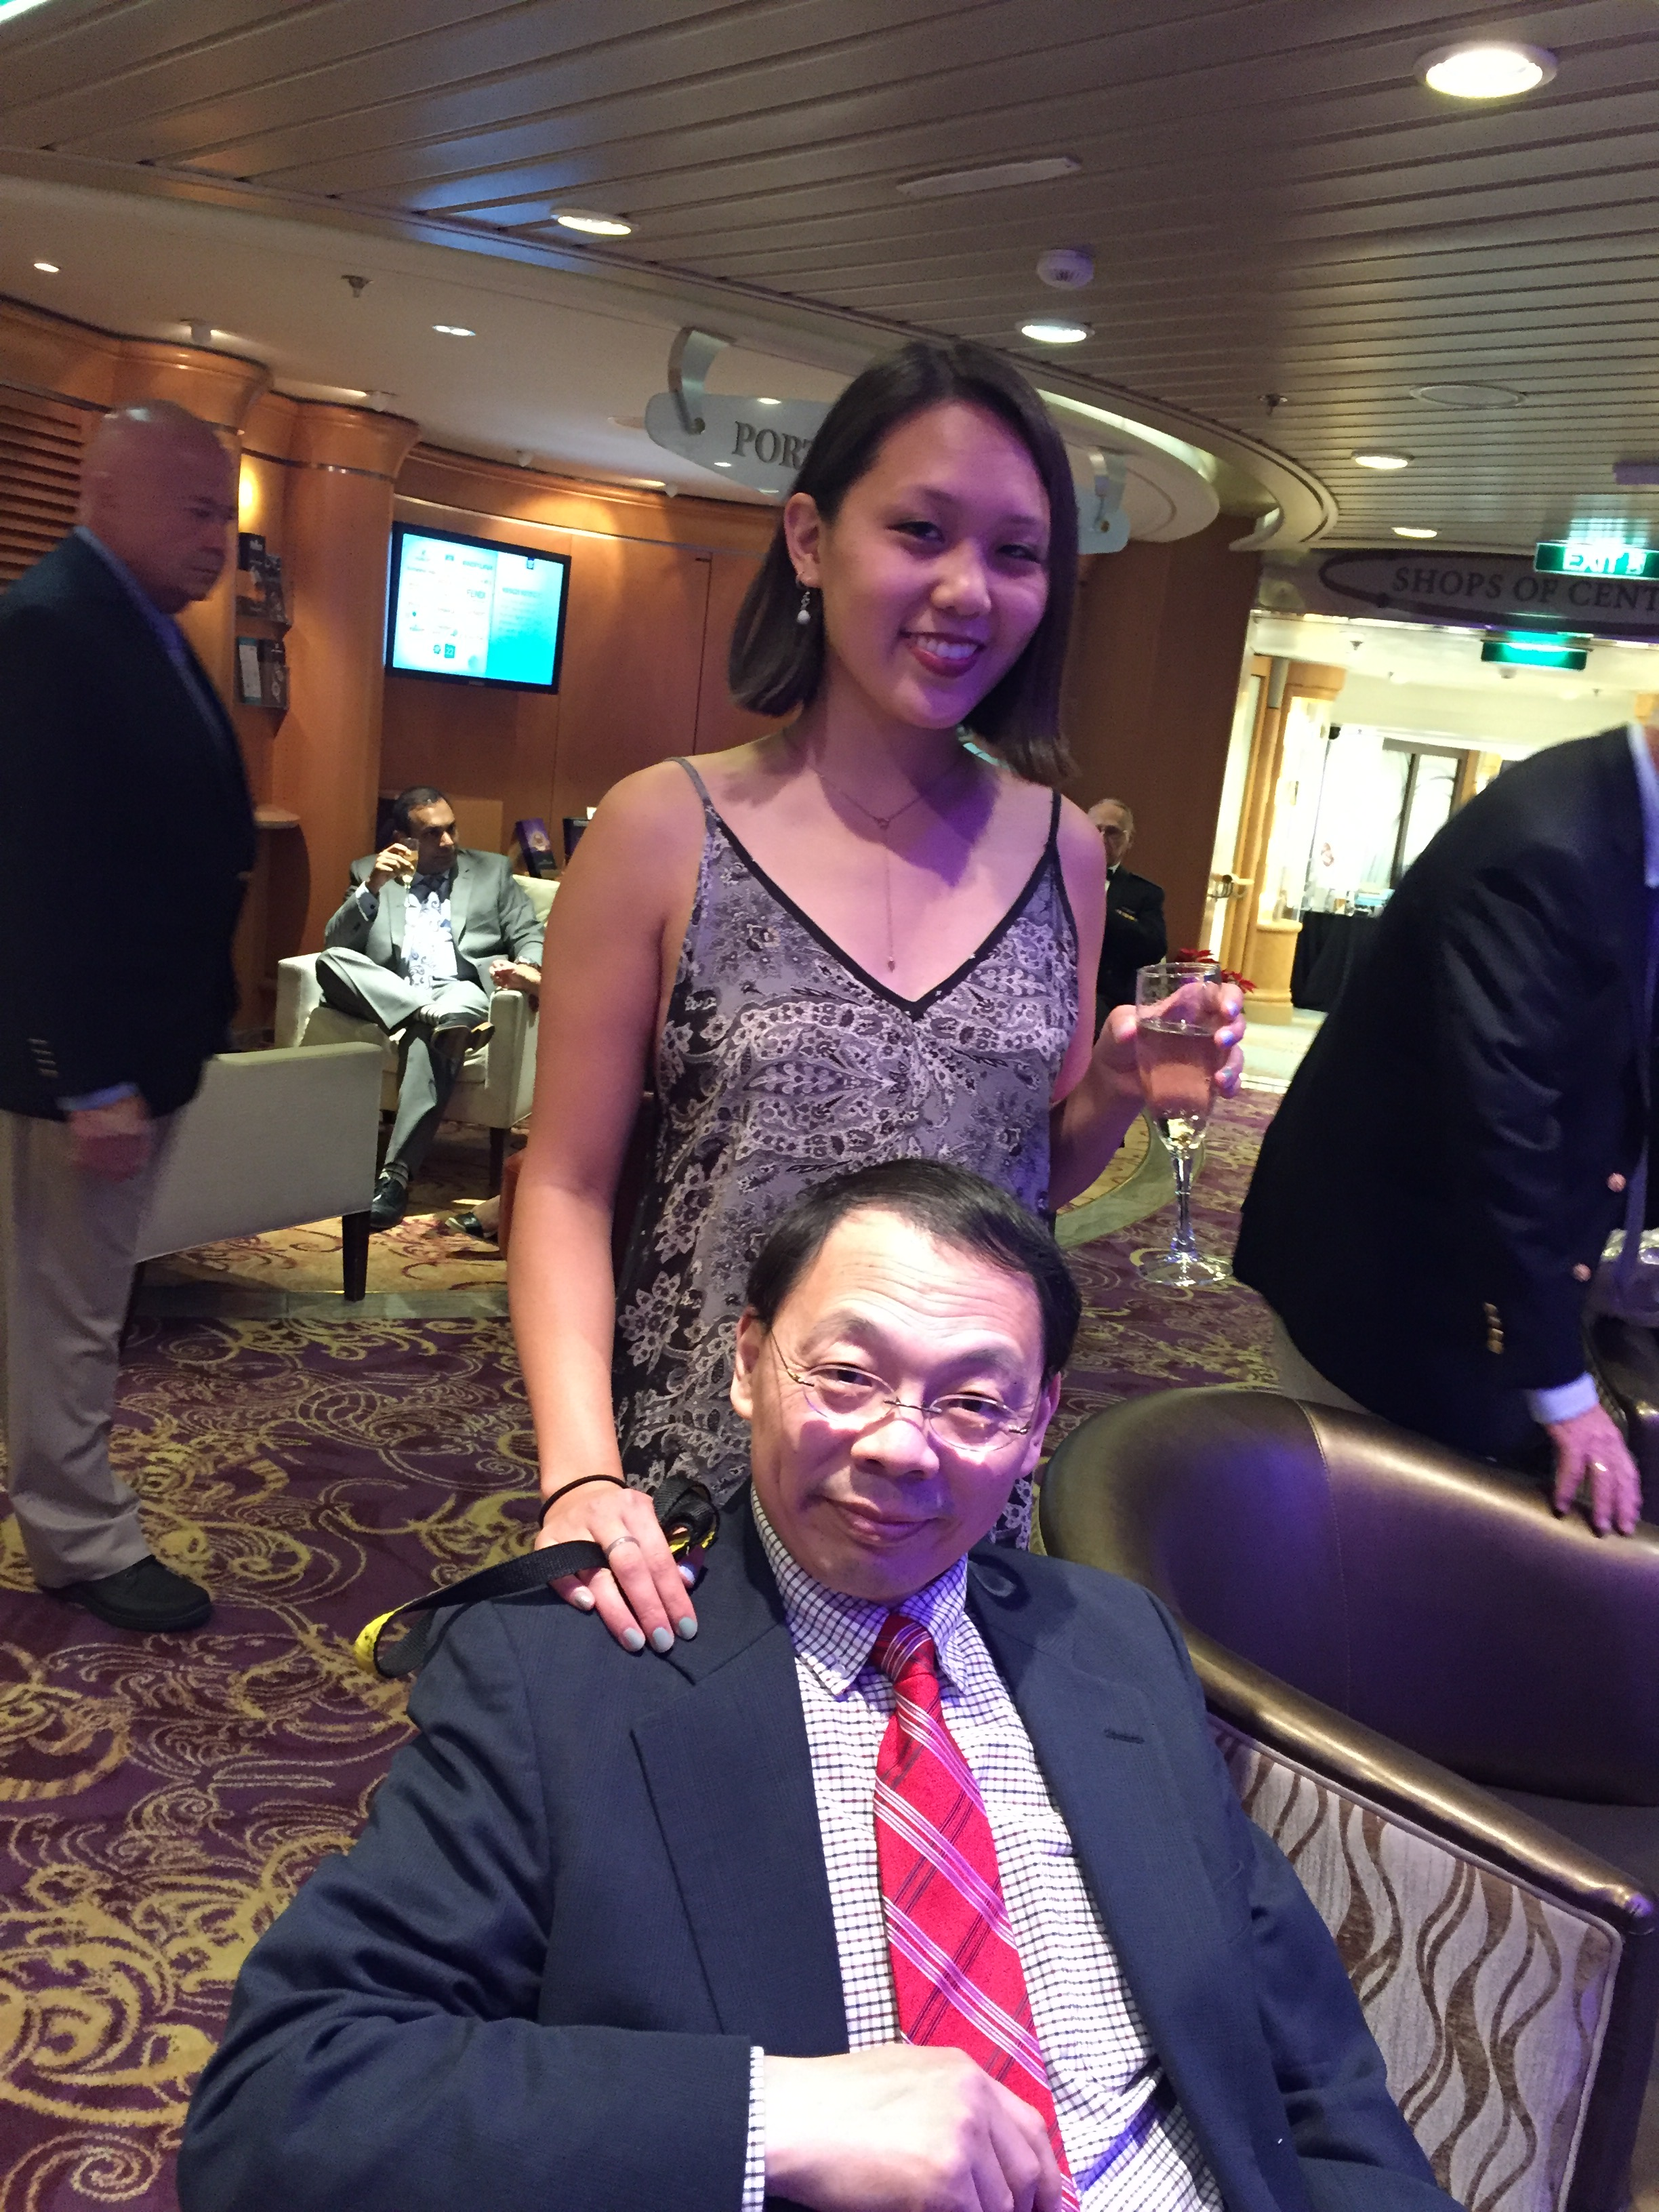 Shirley Wang, 22, with her father, Lin Wang.